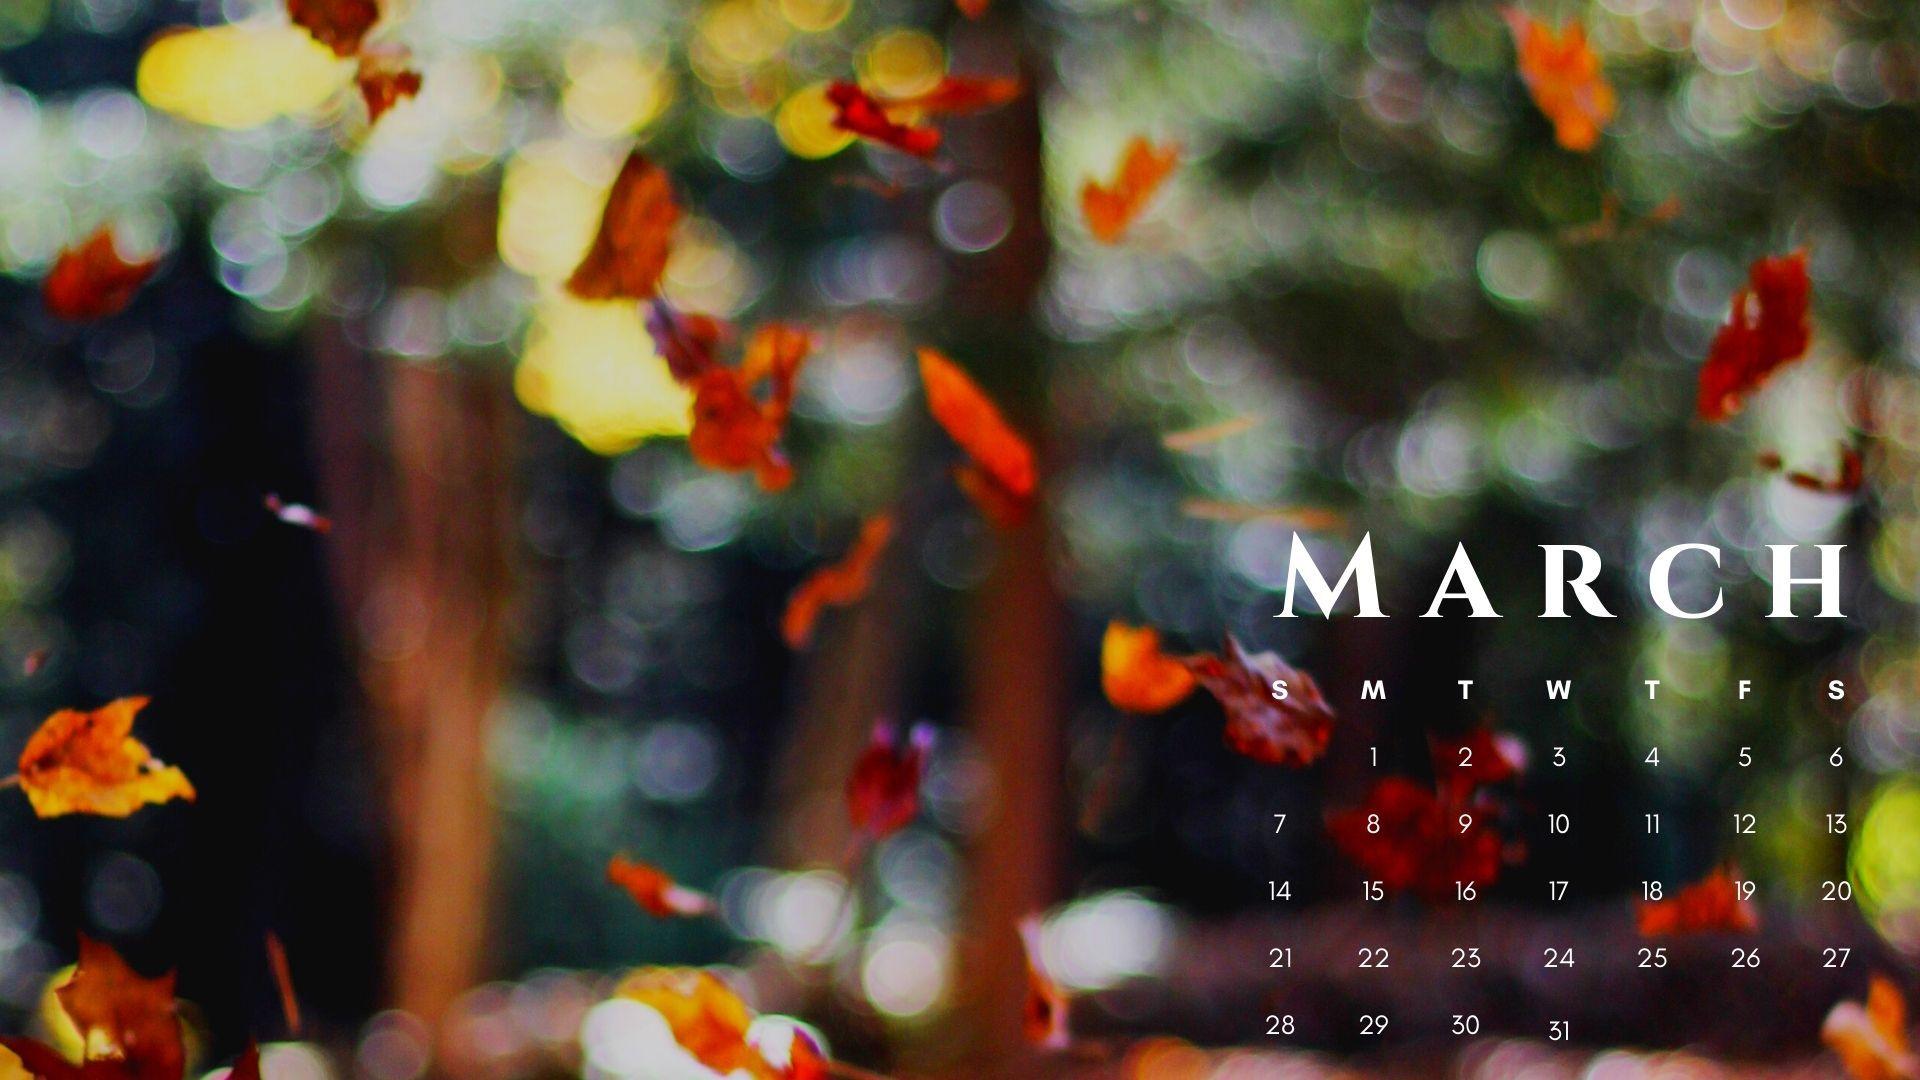 March 2021 Calendar Nature Hd Wallpaper In 2021 Calendar Wallpaper Desktop Calendar February Wallpaper Images wallpaper photo hd download 2021